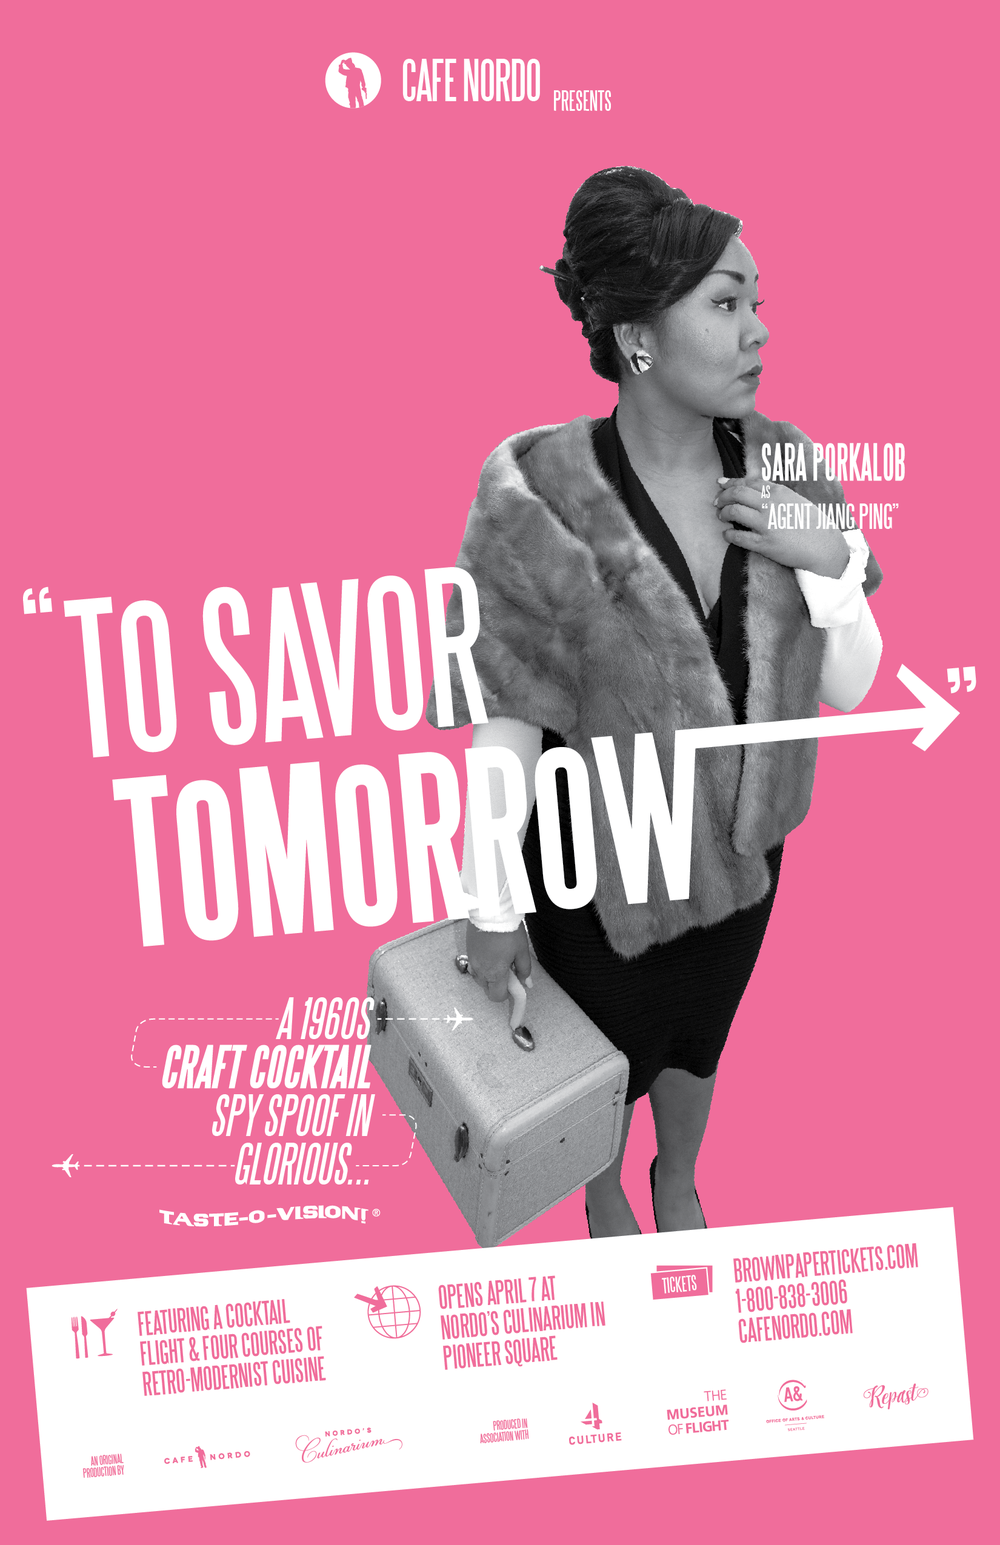 NORDO_ToSavorTomorrow_Poster_Sara.png